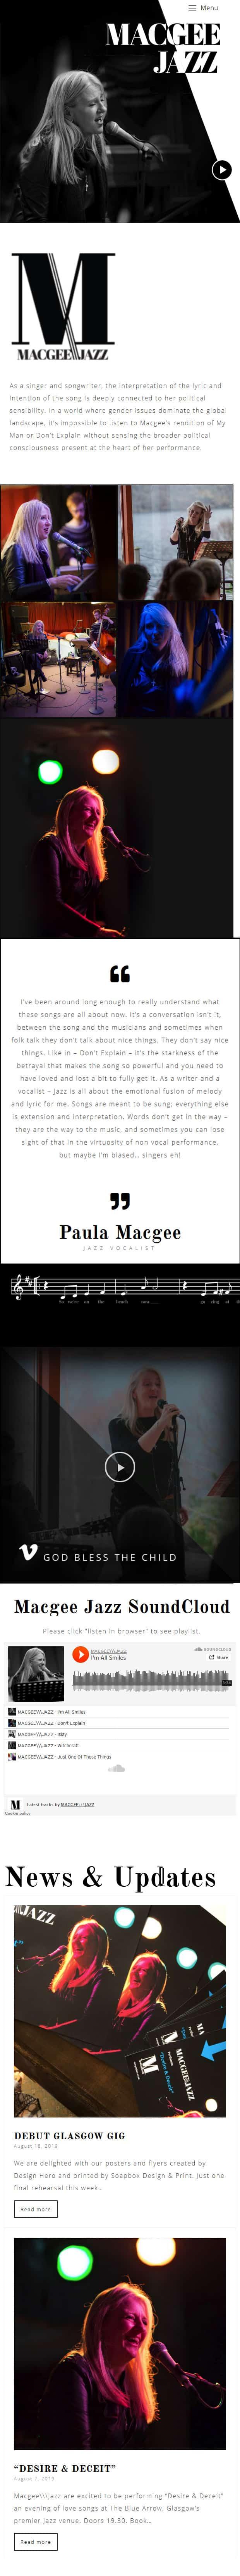 design of mobile first website for jazz musician